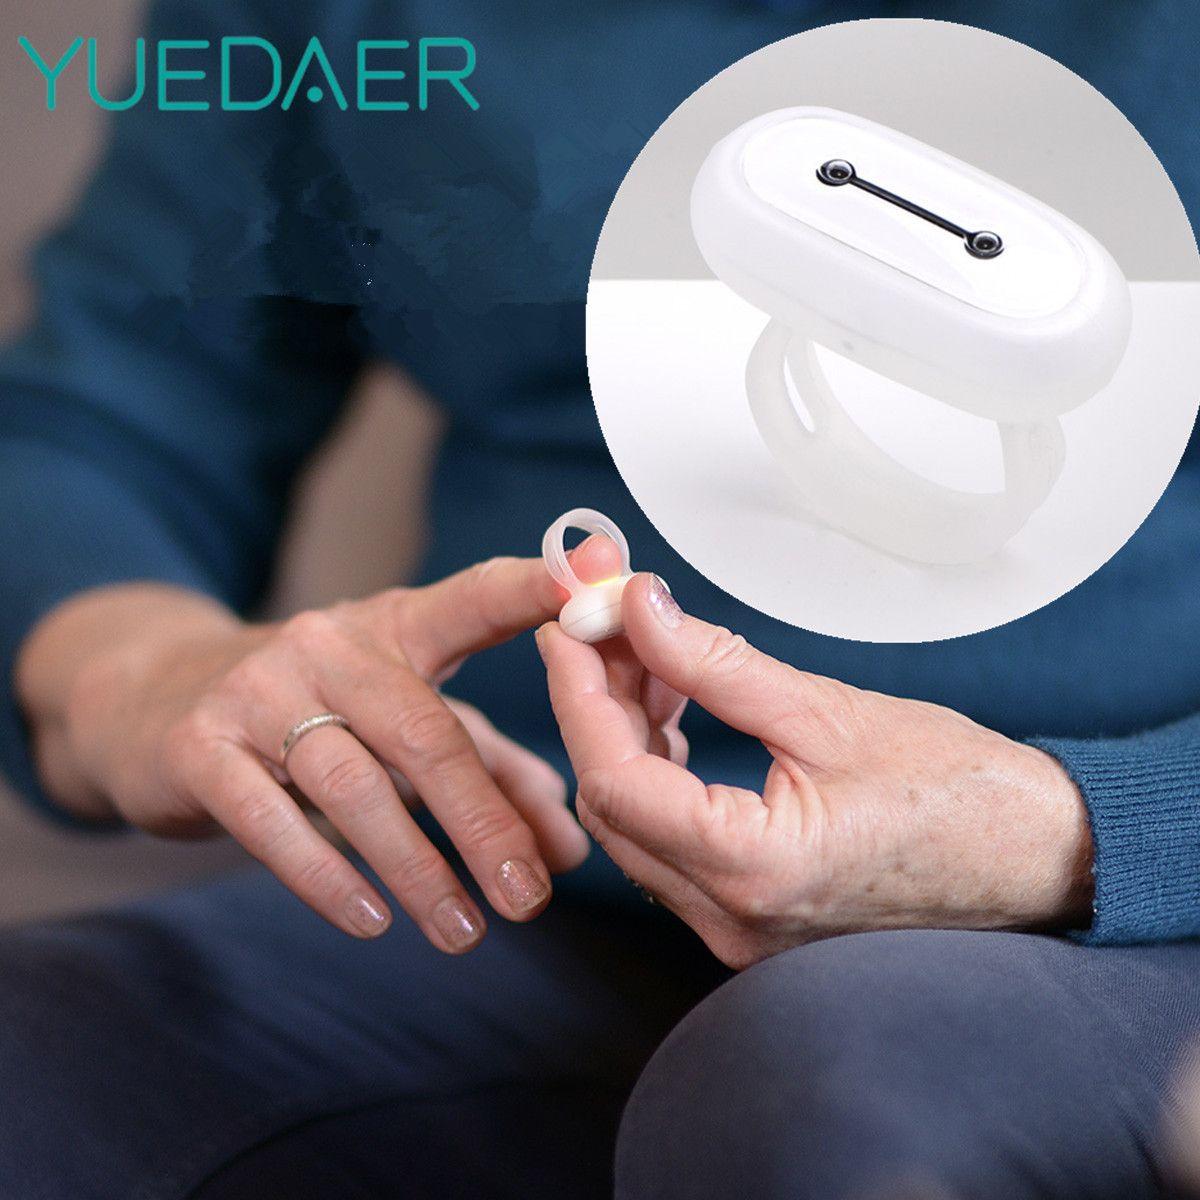 YUEDAER GO2SLEEP Smart Sleep Tracker Ring Pulse Oximeter Blood Oxygen Smart Sleep Monitoring Ring SPO2 Heart Rate Monitor Device